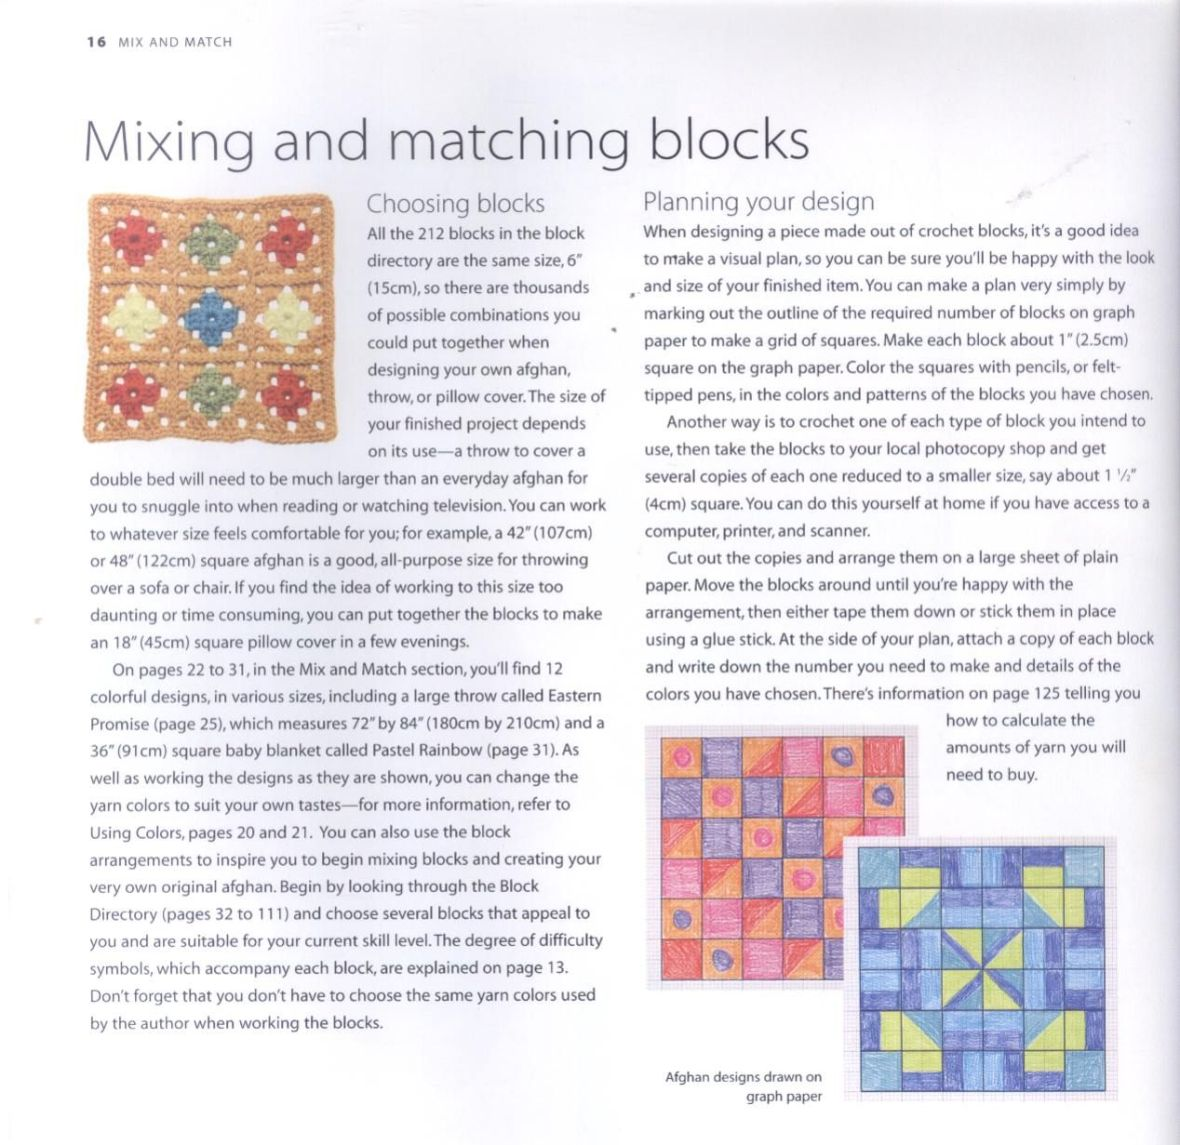 200 Crocheted Blocks for blankets, throws & Afghans 016